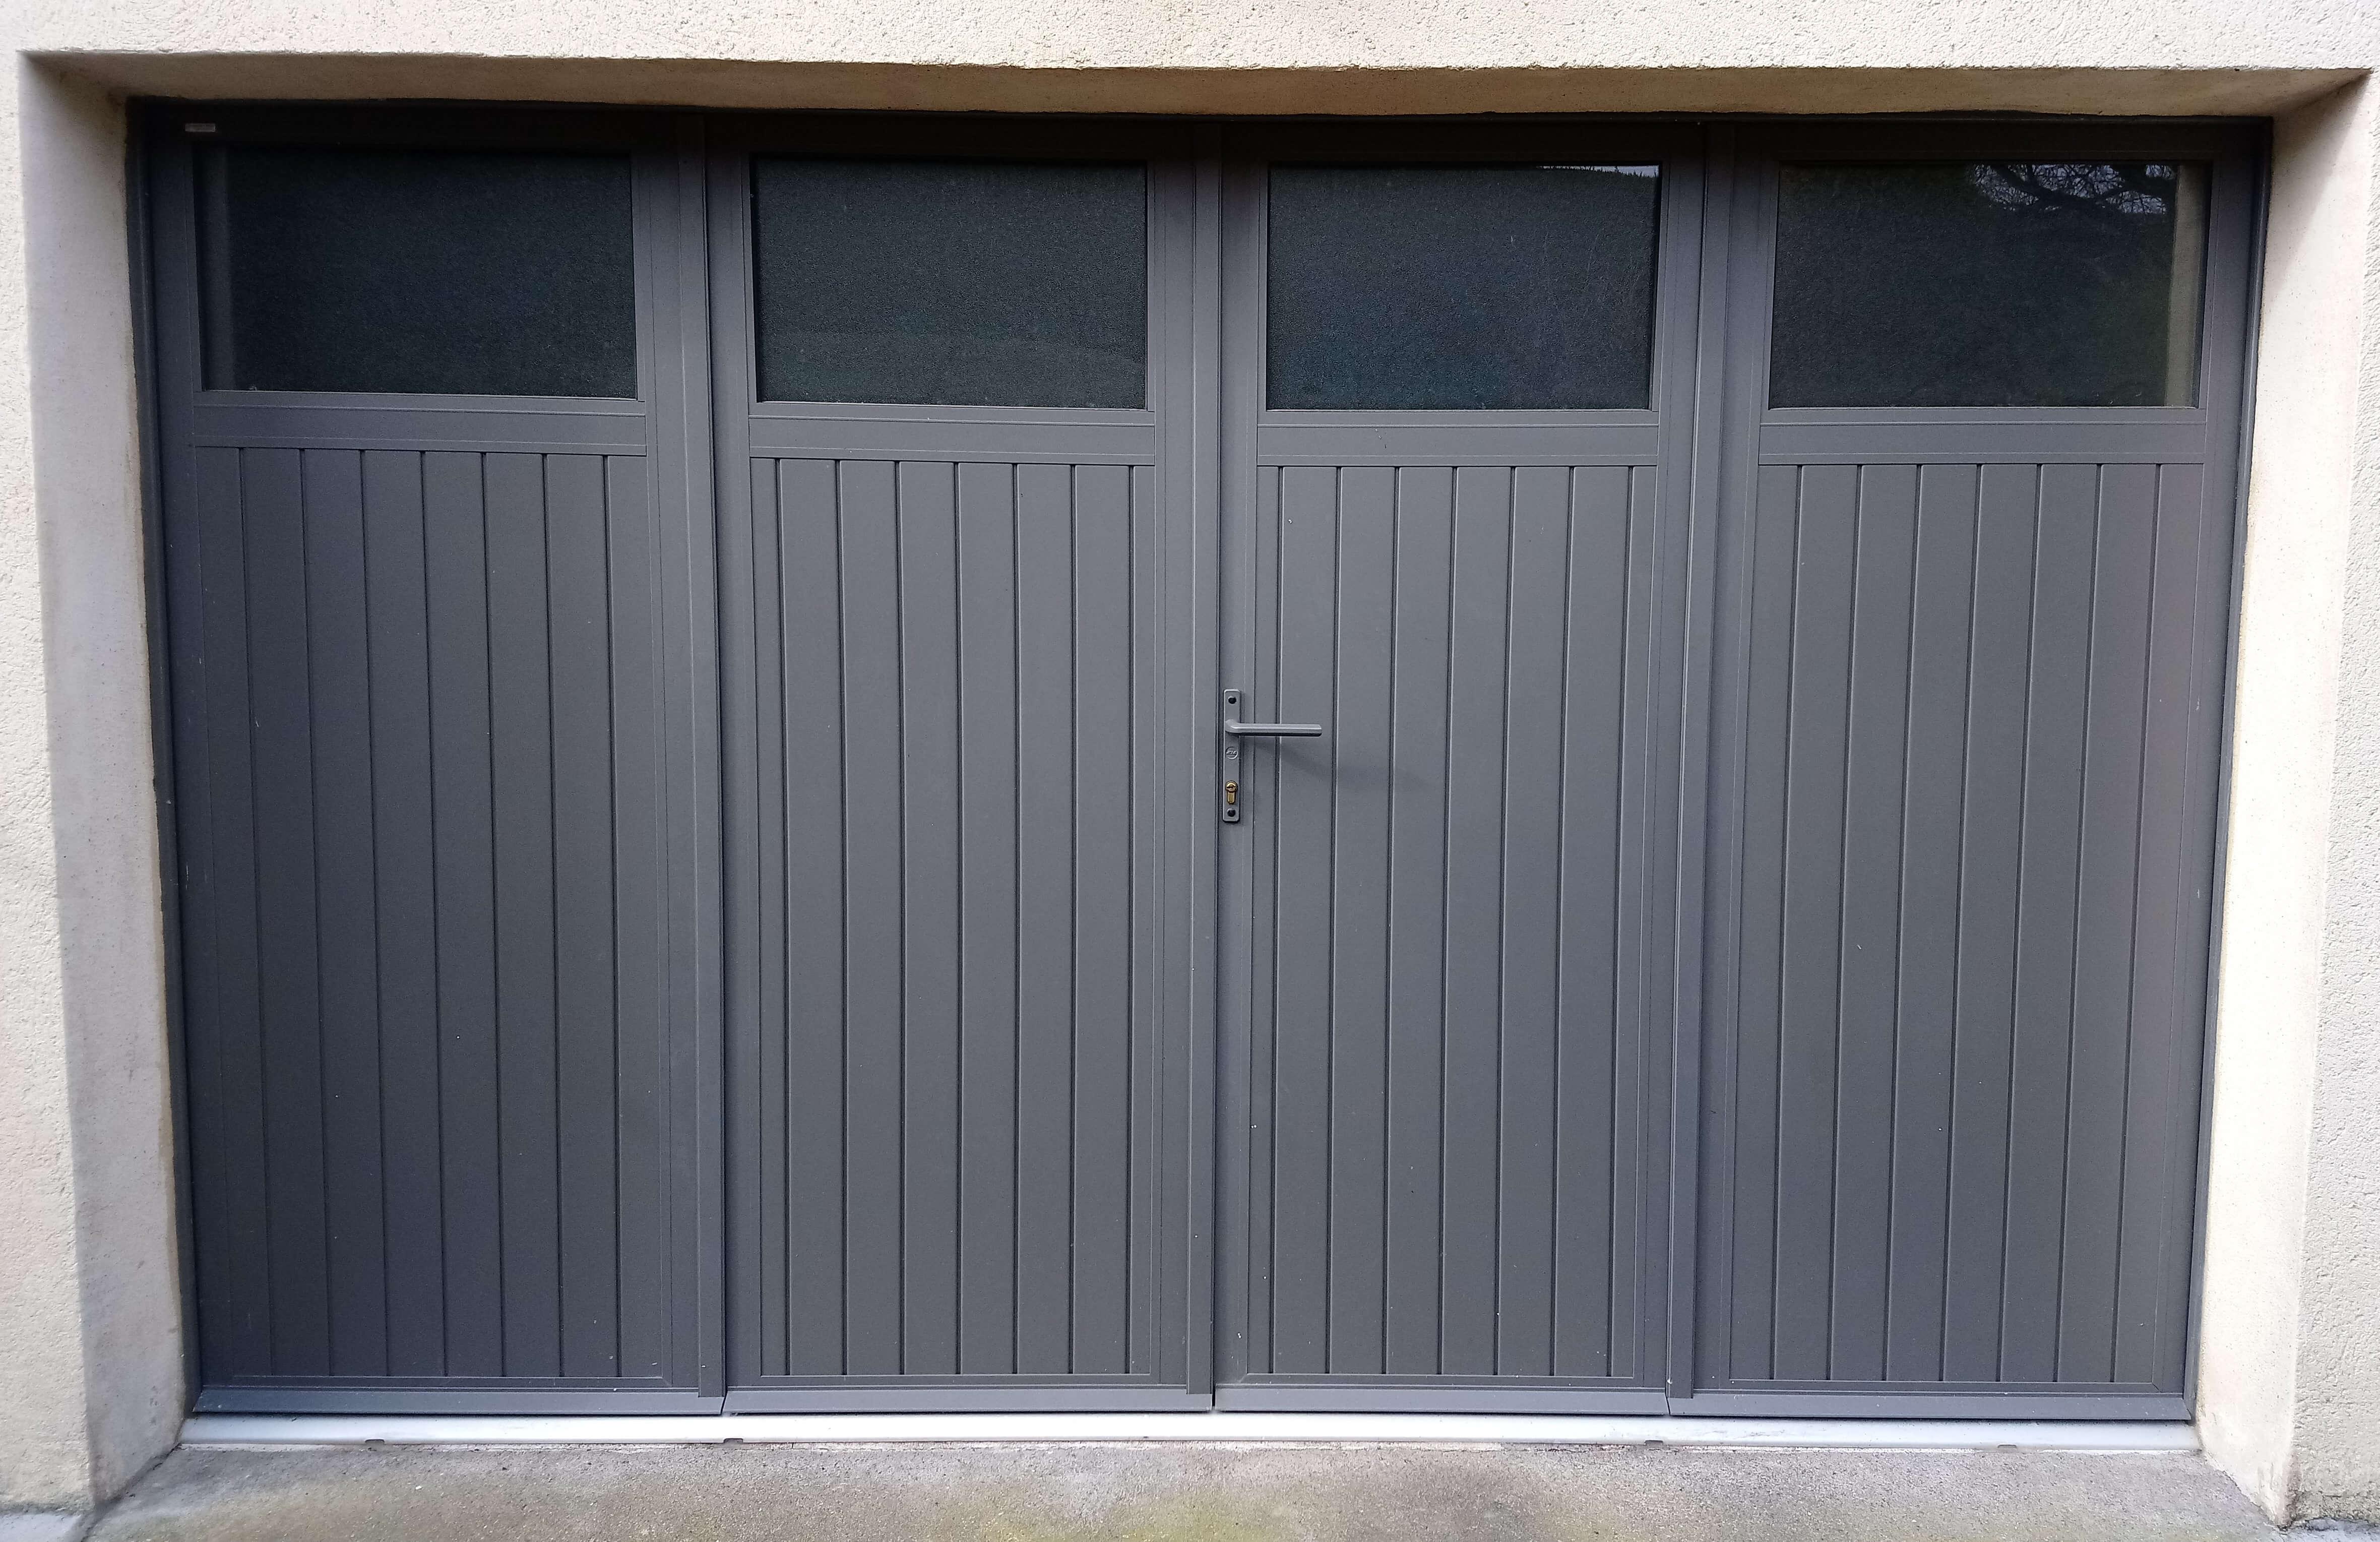 Menuiserie Figard - Fabrication sur mesure - Porte de garage 4 battants - Aluminium - Vesoul